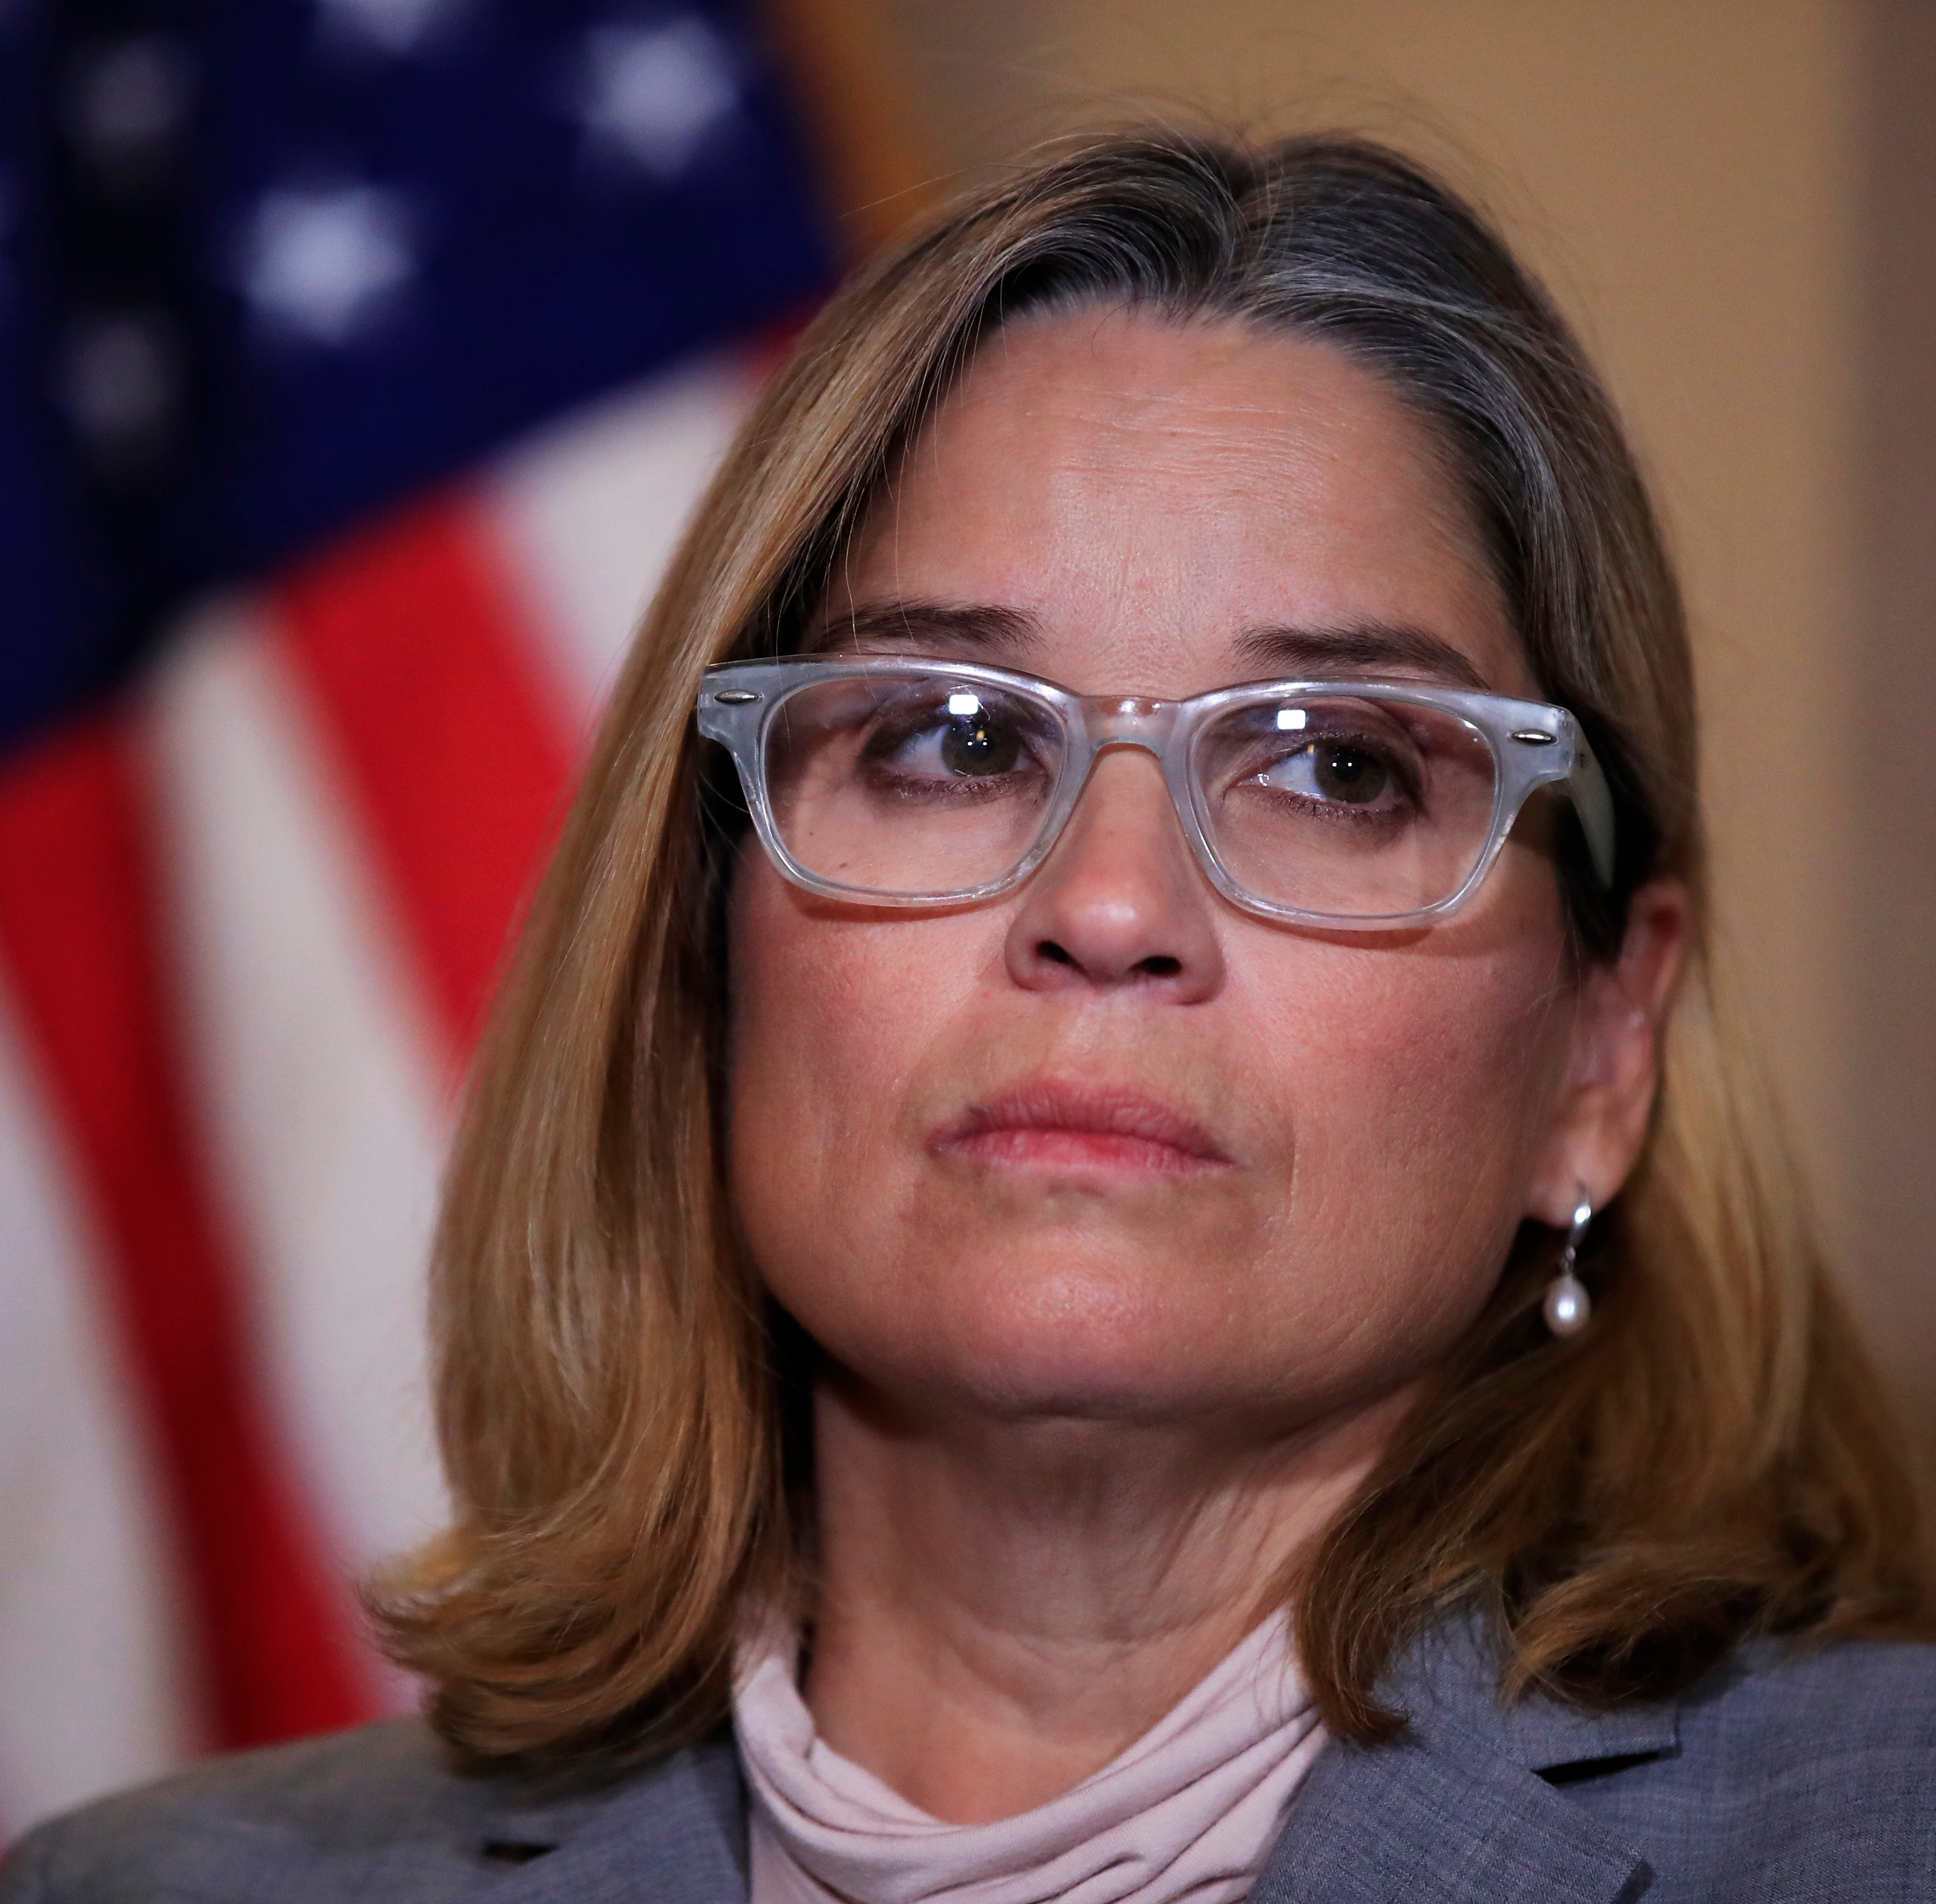 San Juan, Puerto Rico, Mayor Carmen Yulín Cruz, attends a House Democratic Leaders news conference with Democratic Caucus Chairman Rep. Joe Crowley, D-N.Y., on Capitol Hill in Washington, on Nov. 1, 2017.